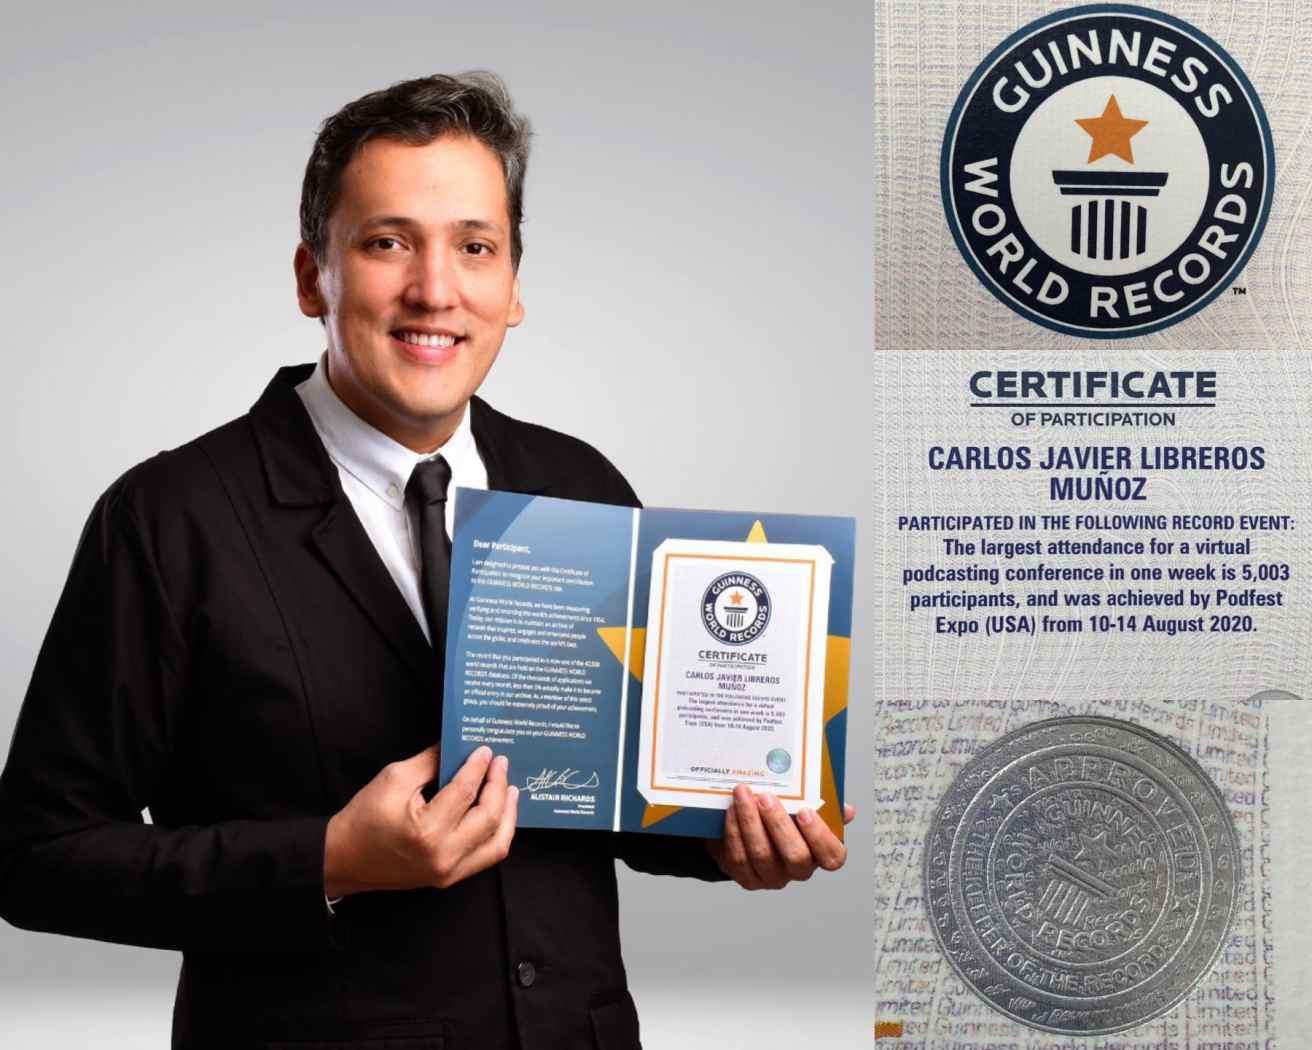 Carlo Guinness